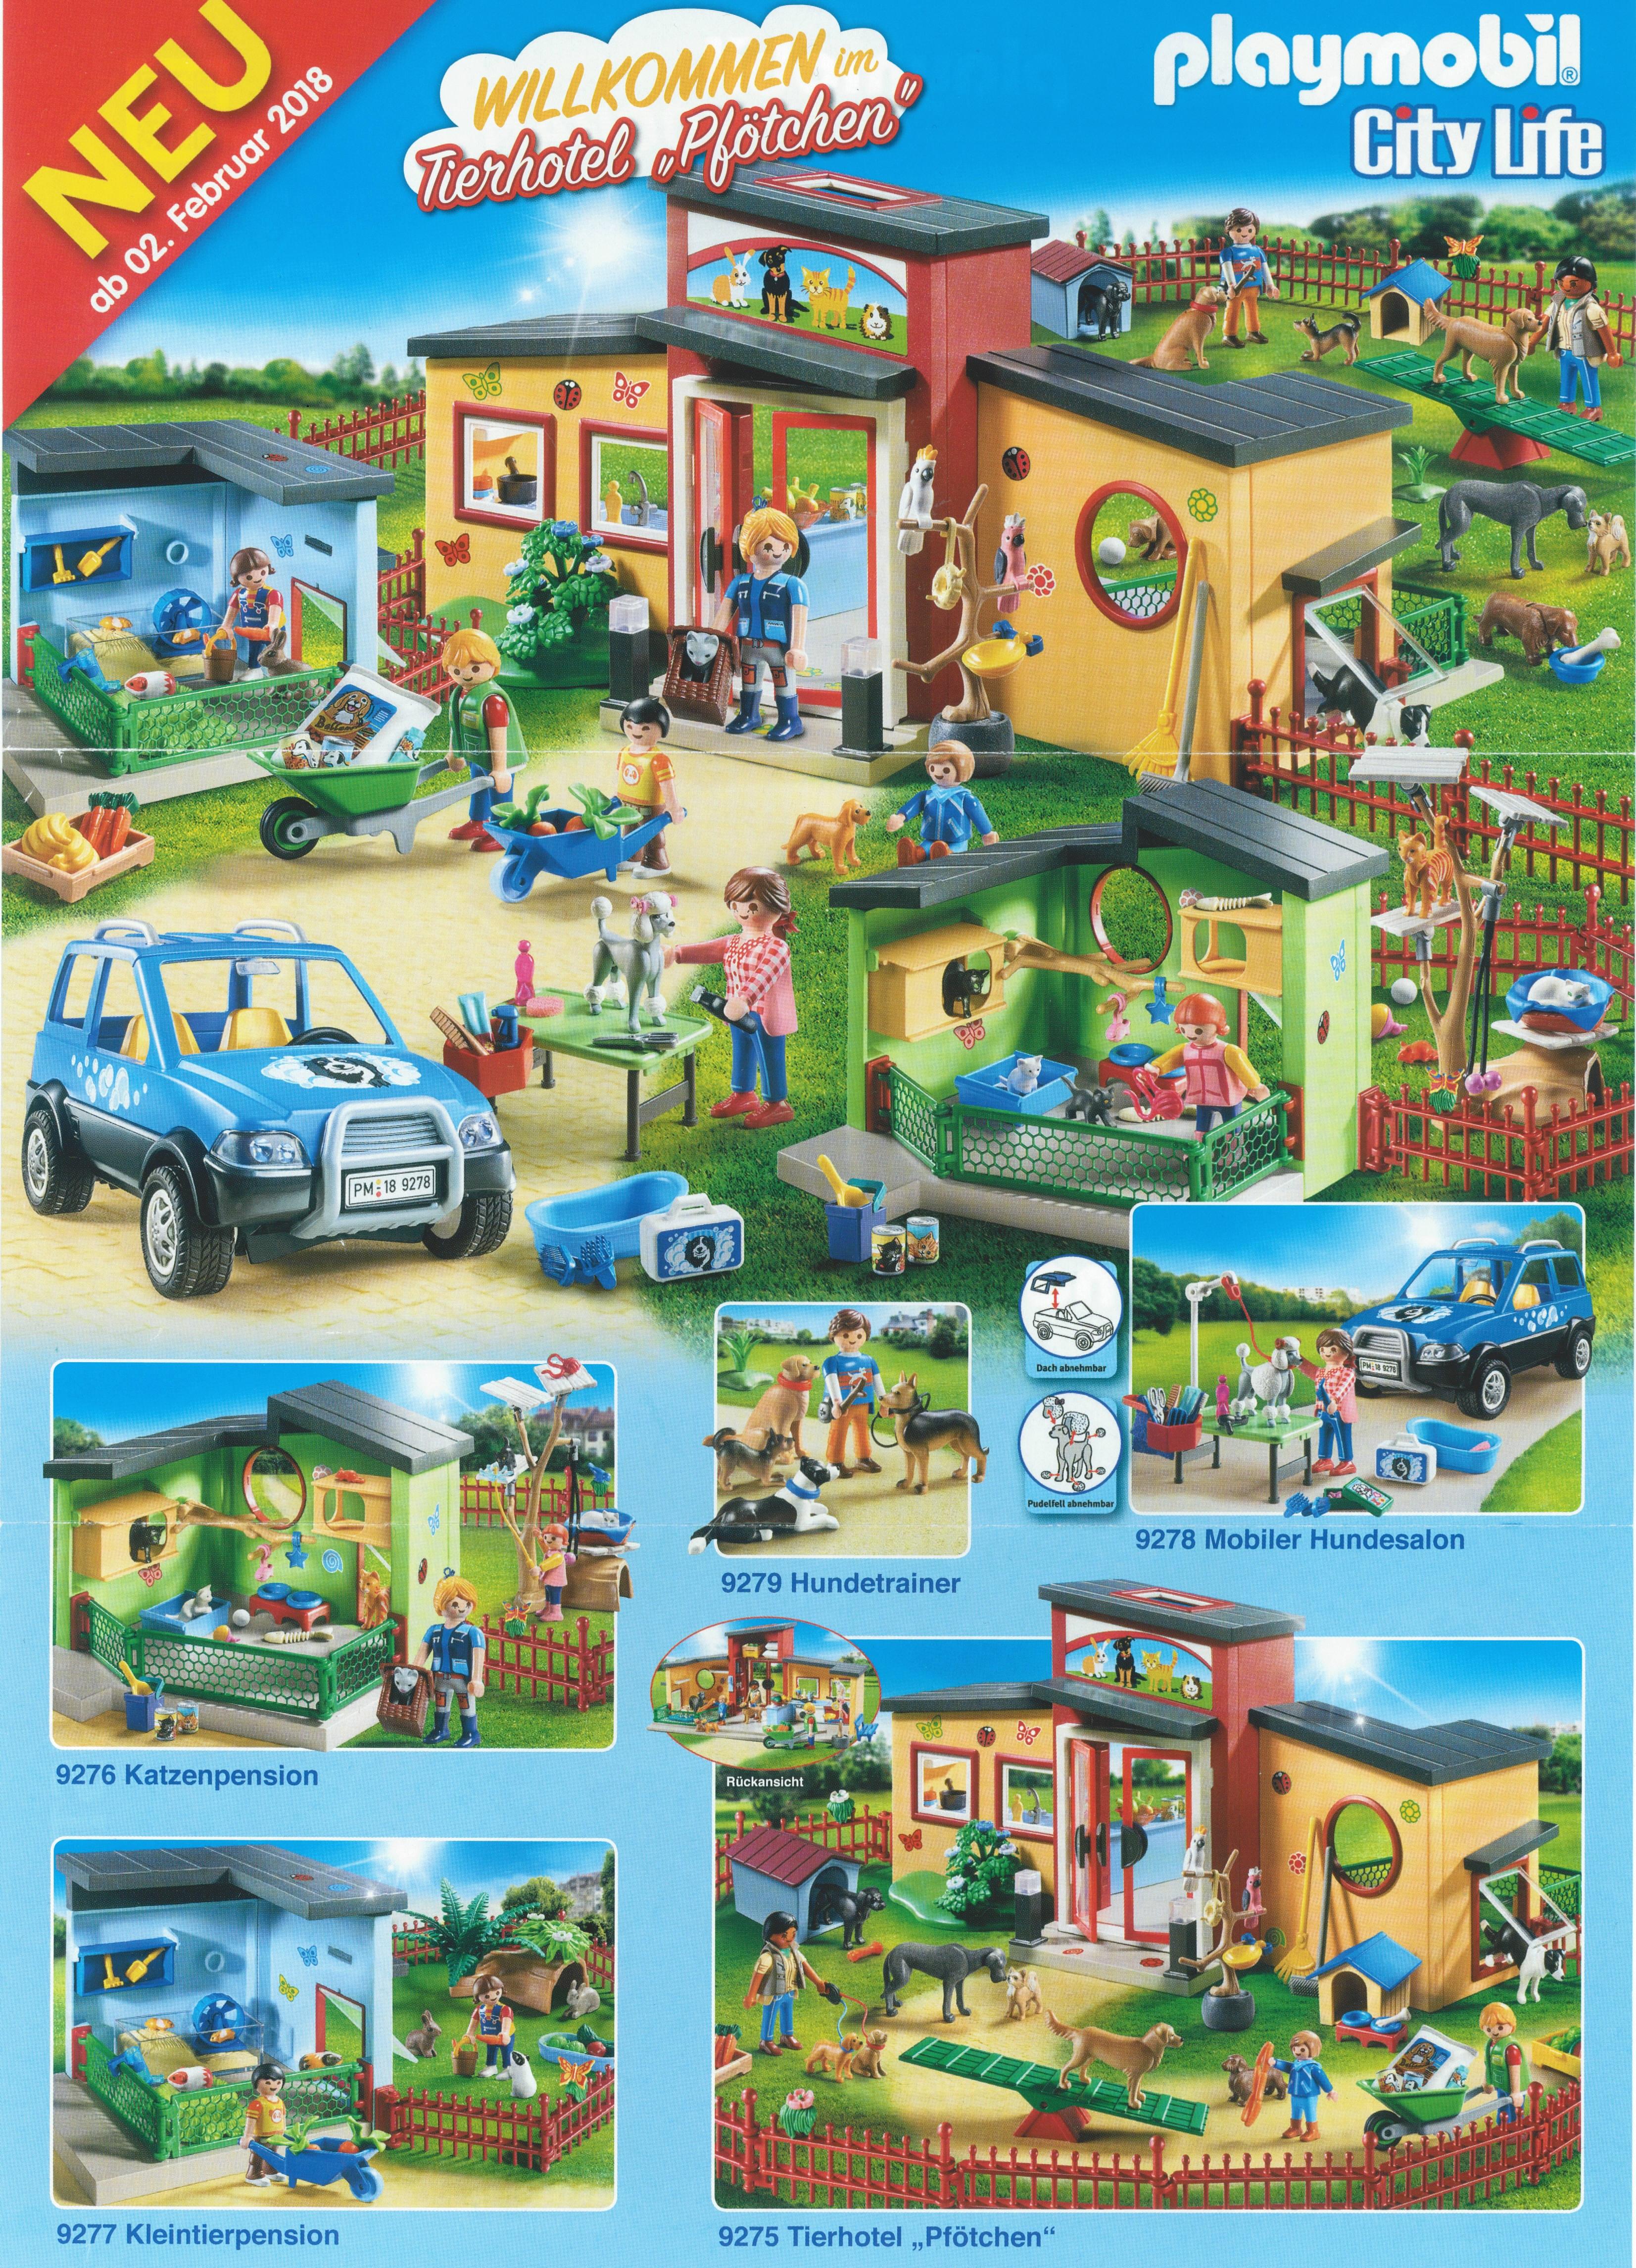 Playmobil neuheit tierhotel pf tchen testsieger for Maison moderne playmobil 2018